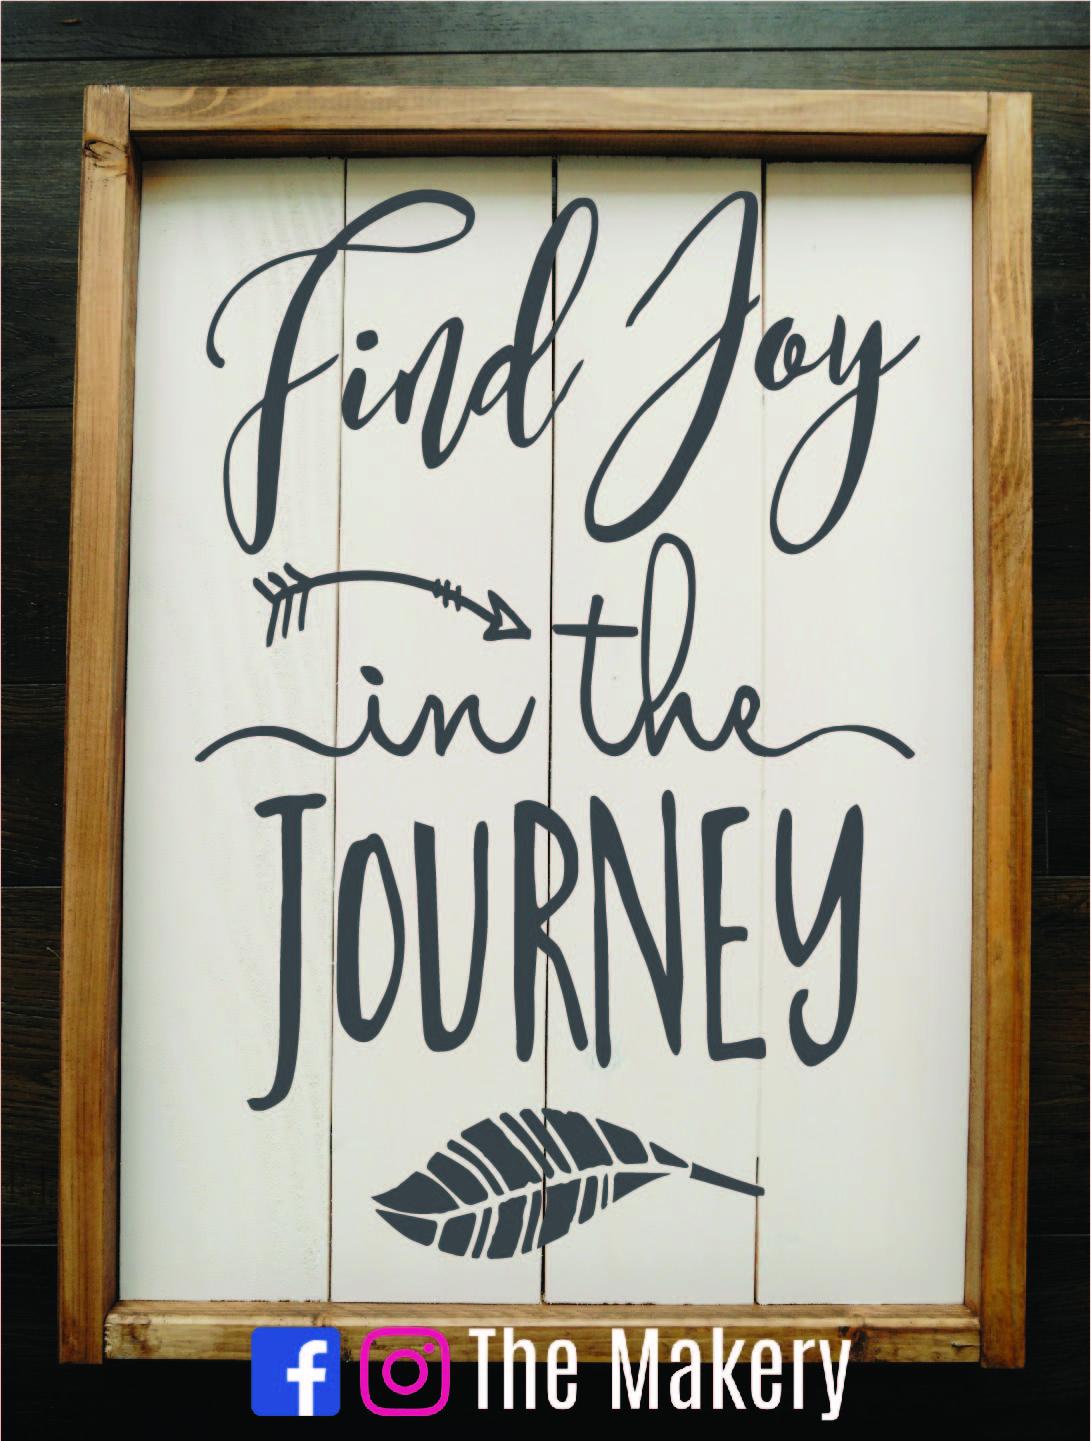 Find Joy in the Journey.jpg